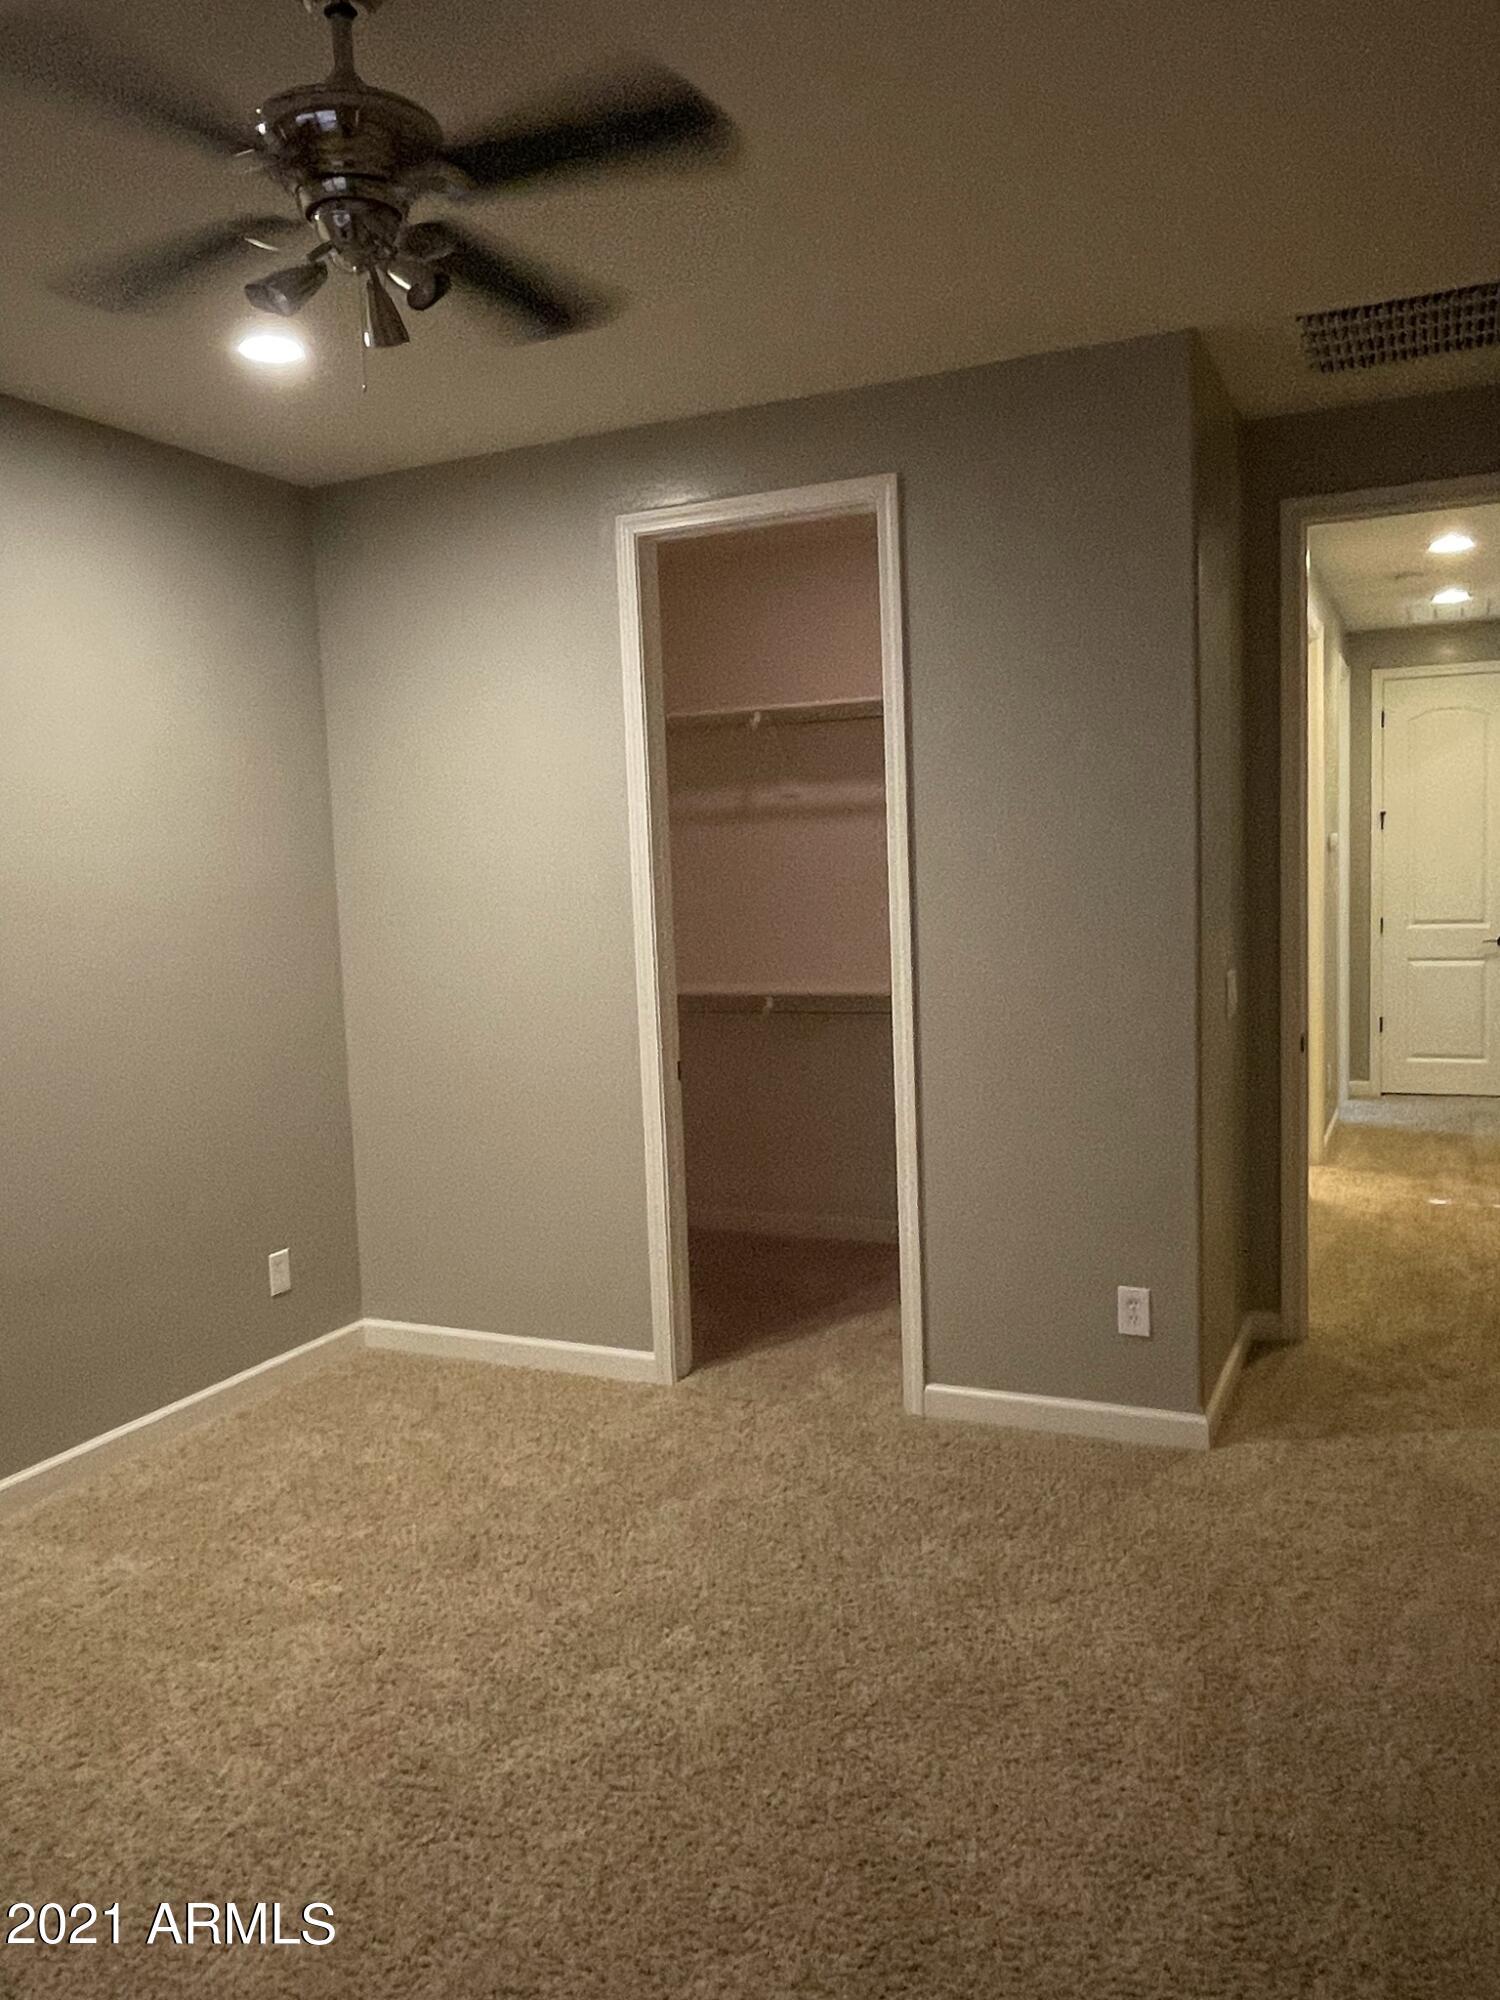 22060 Rosa Road, Queen Creek, Arizona 85142, 4 Bedrooms Bedrooms, ,3.5 BathroomsBathrooms,Residential,For Sale,Rosa,6267469